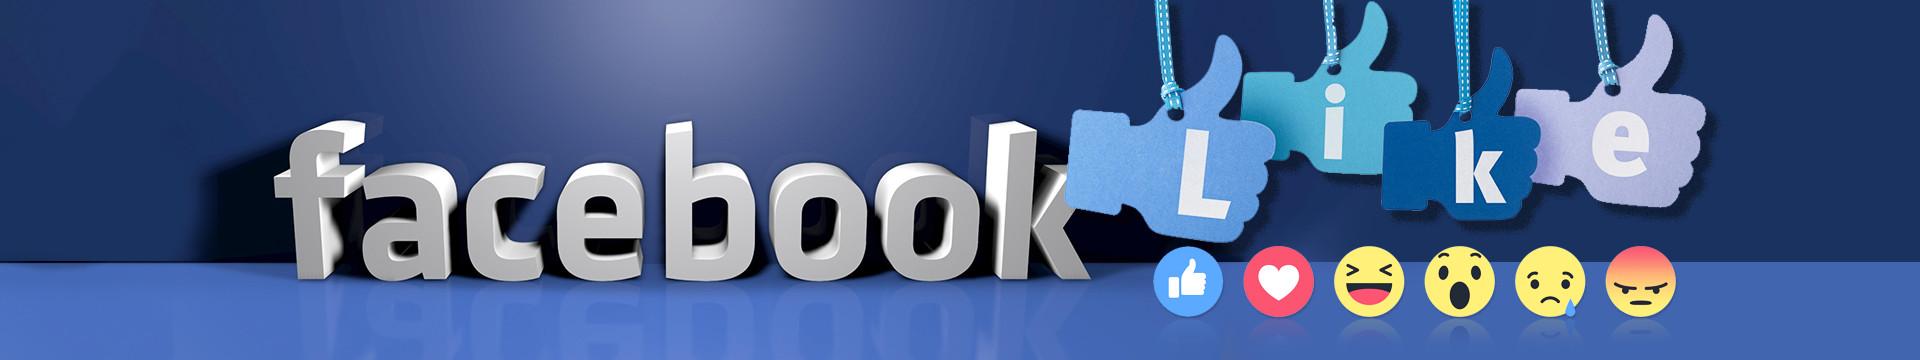 Facebook Marketing Training Courses